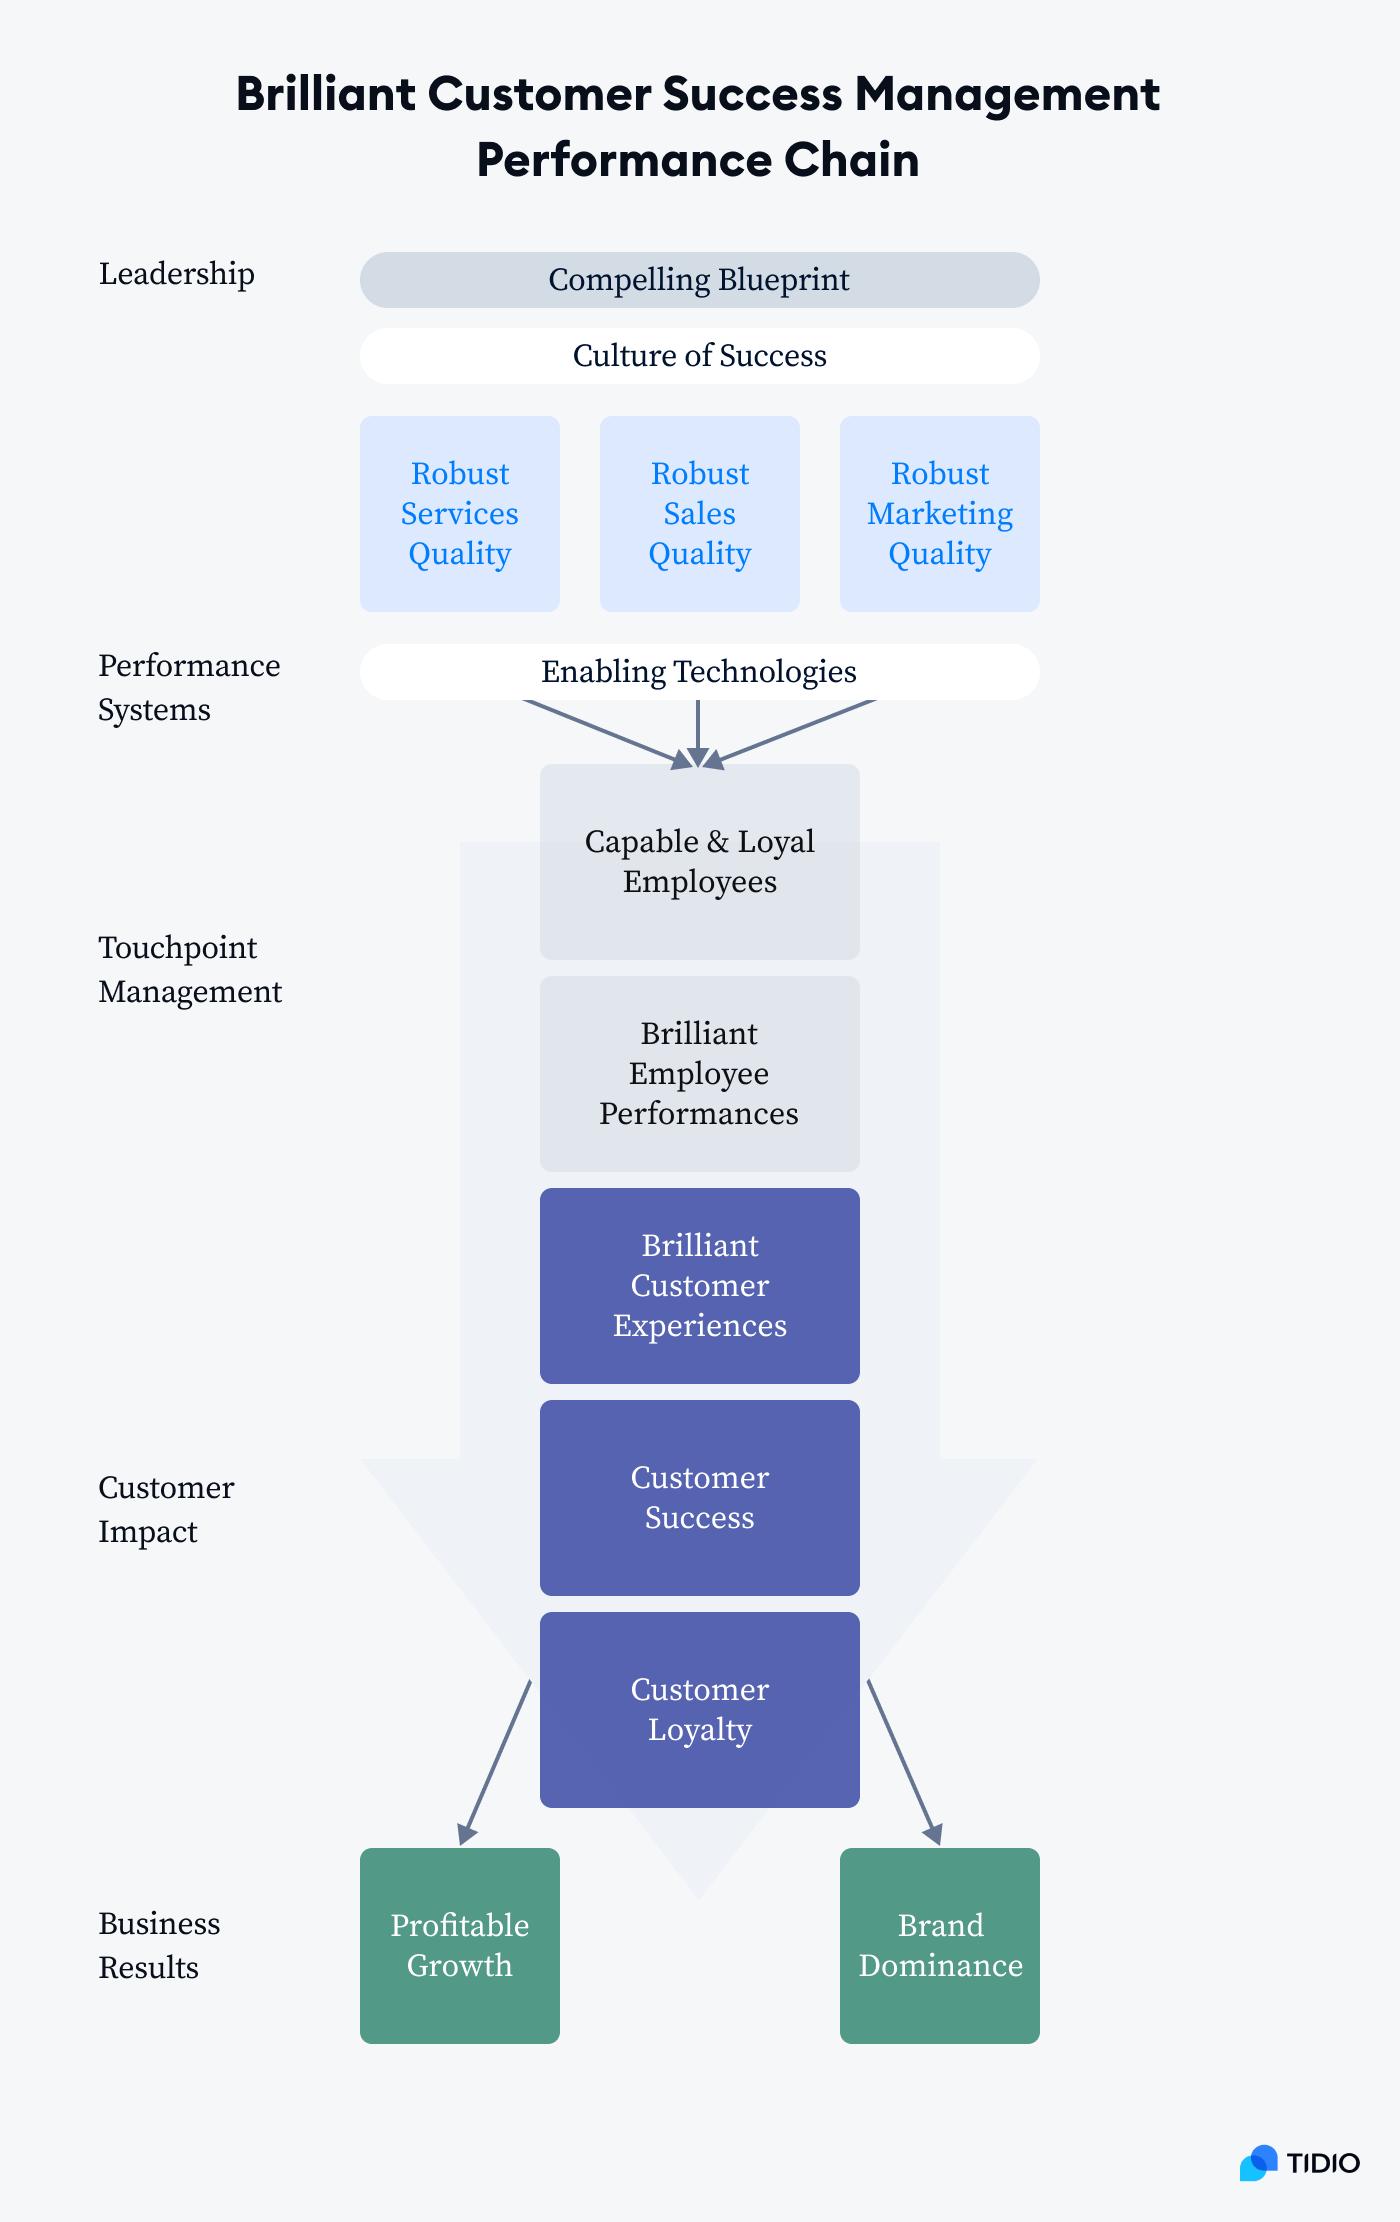 Brilliant Customer Success Management Performance Chain